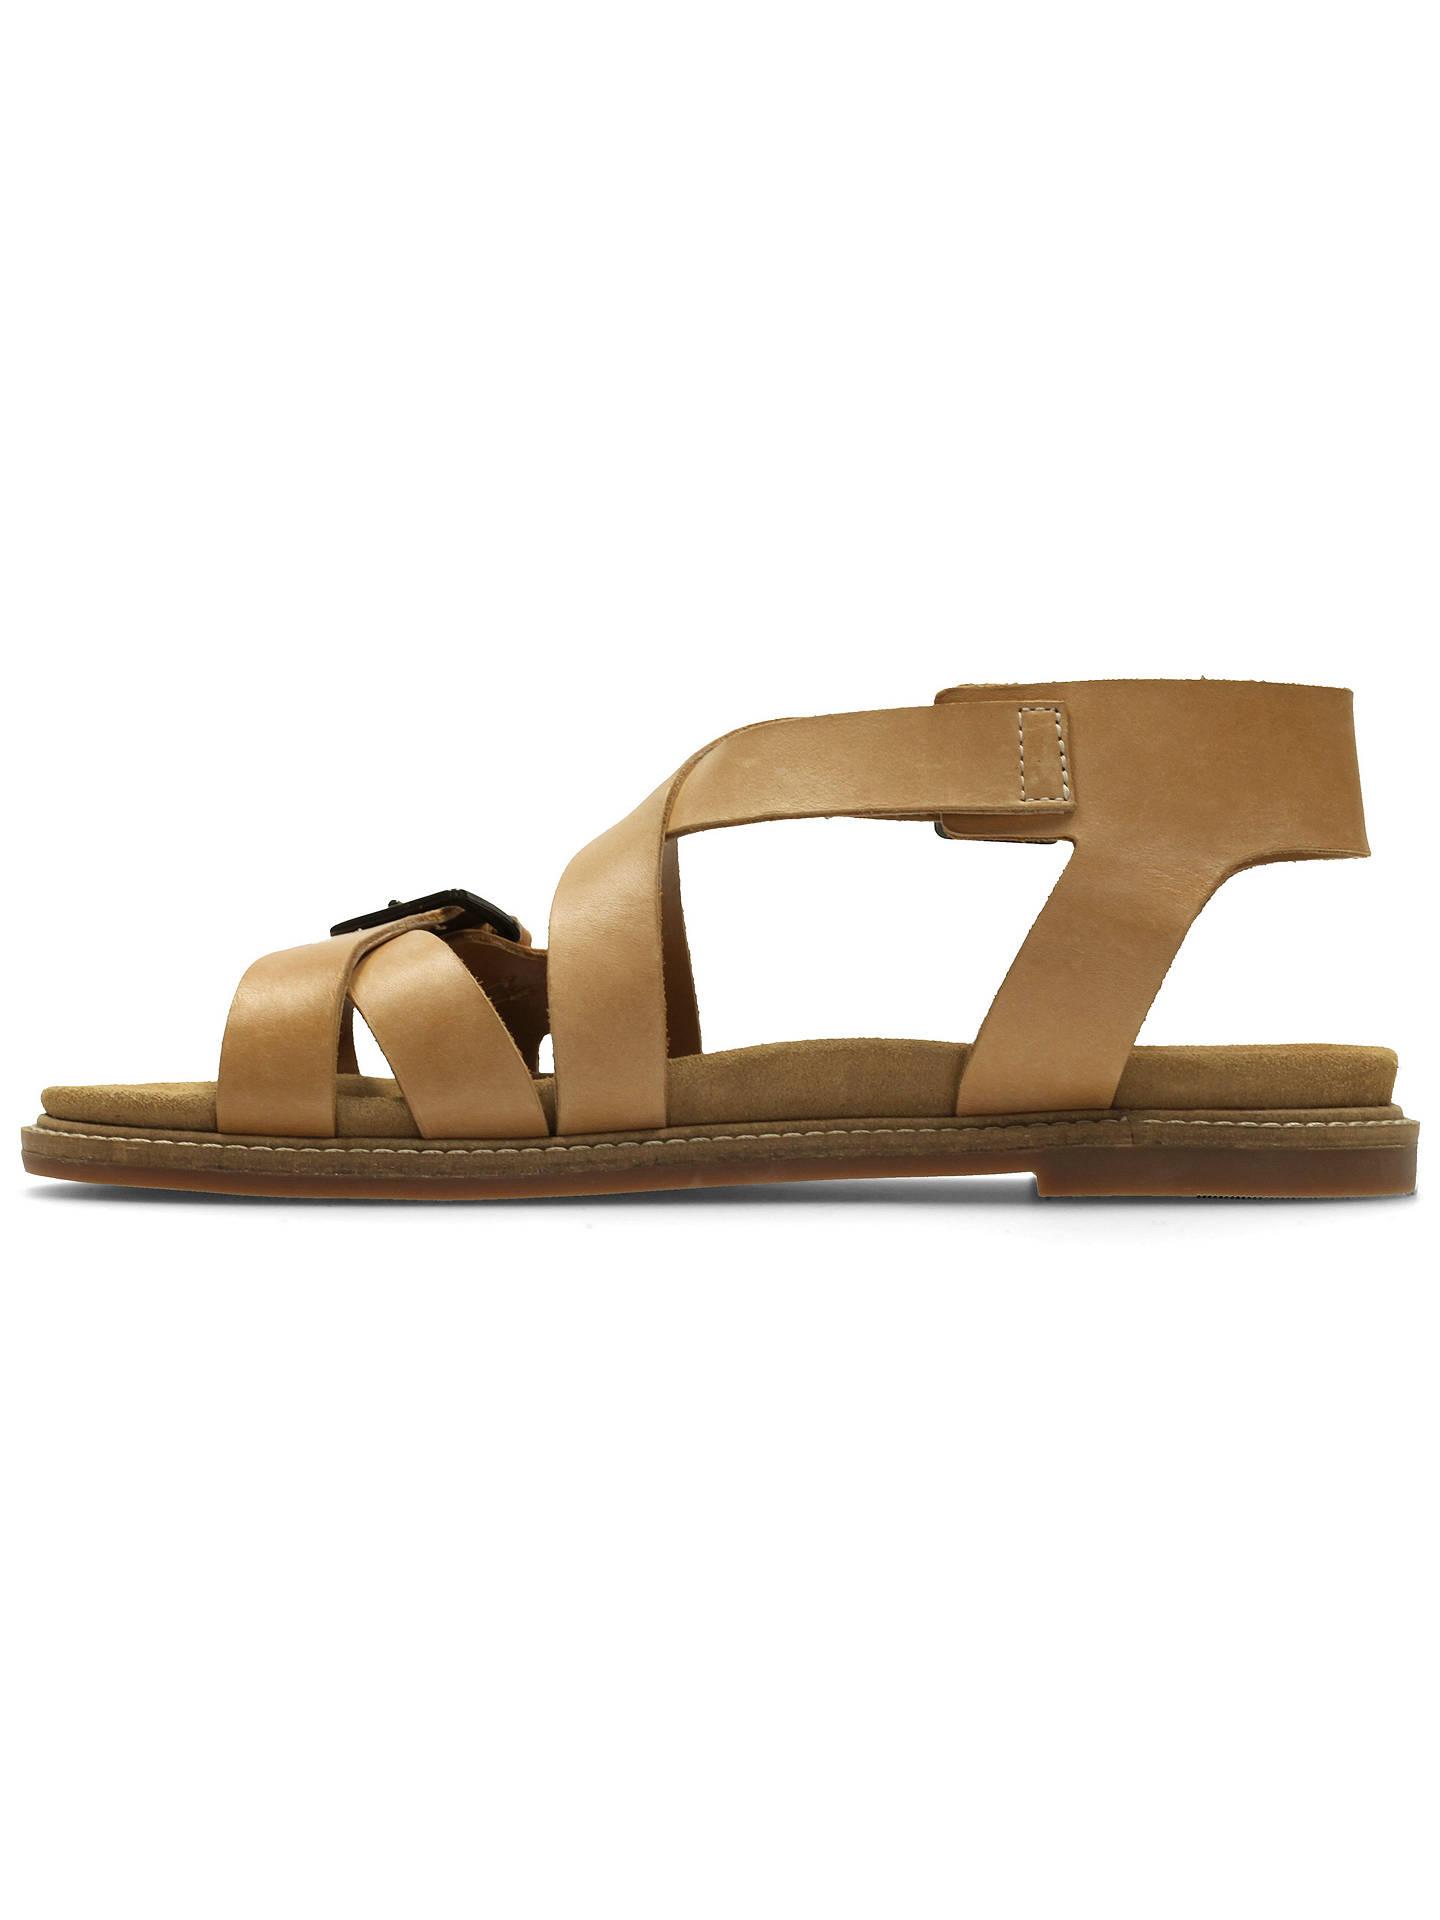 44ebc392885 Buy Clarks Corsio Bambi Cross Strap Sandals